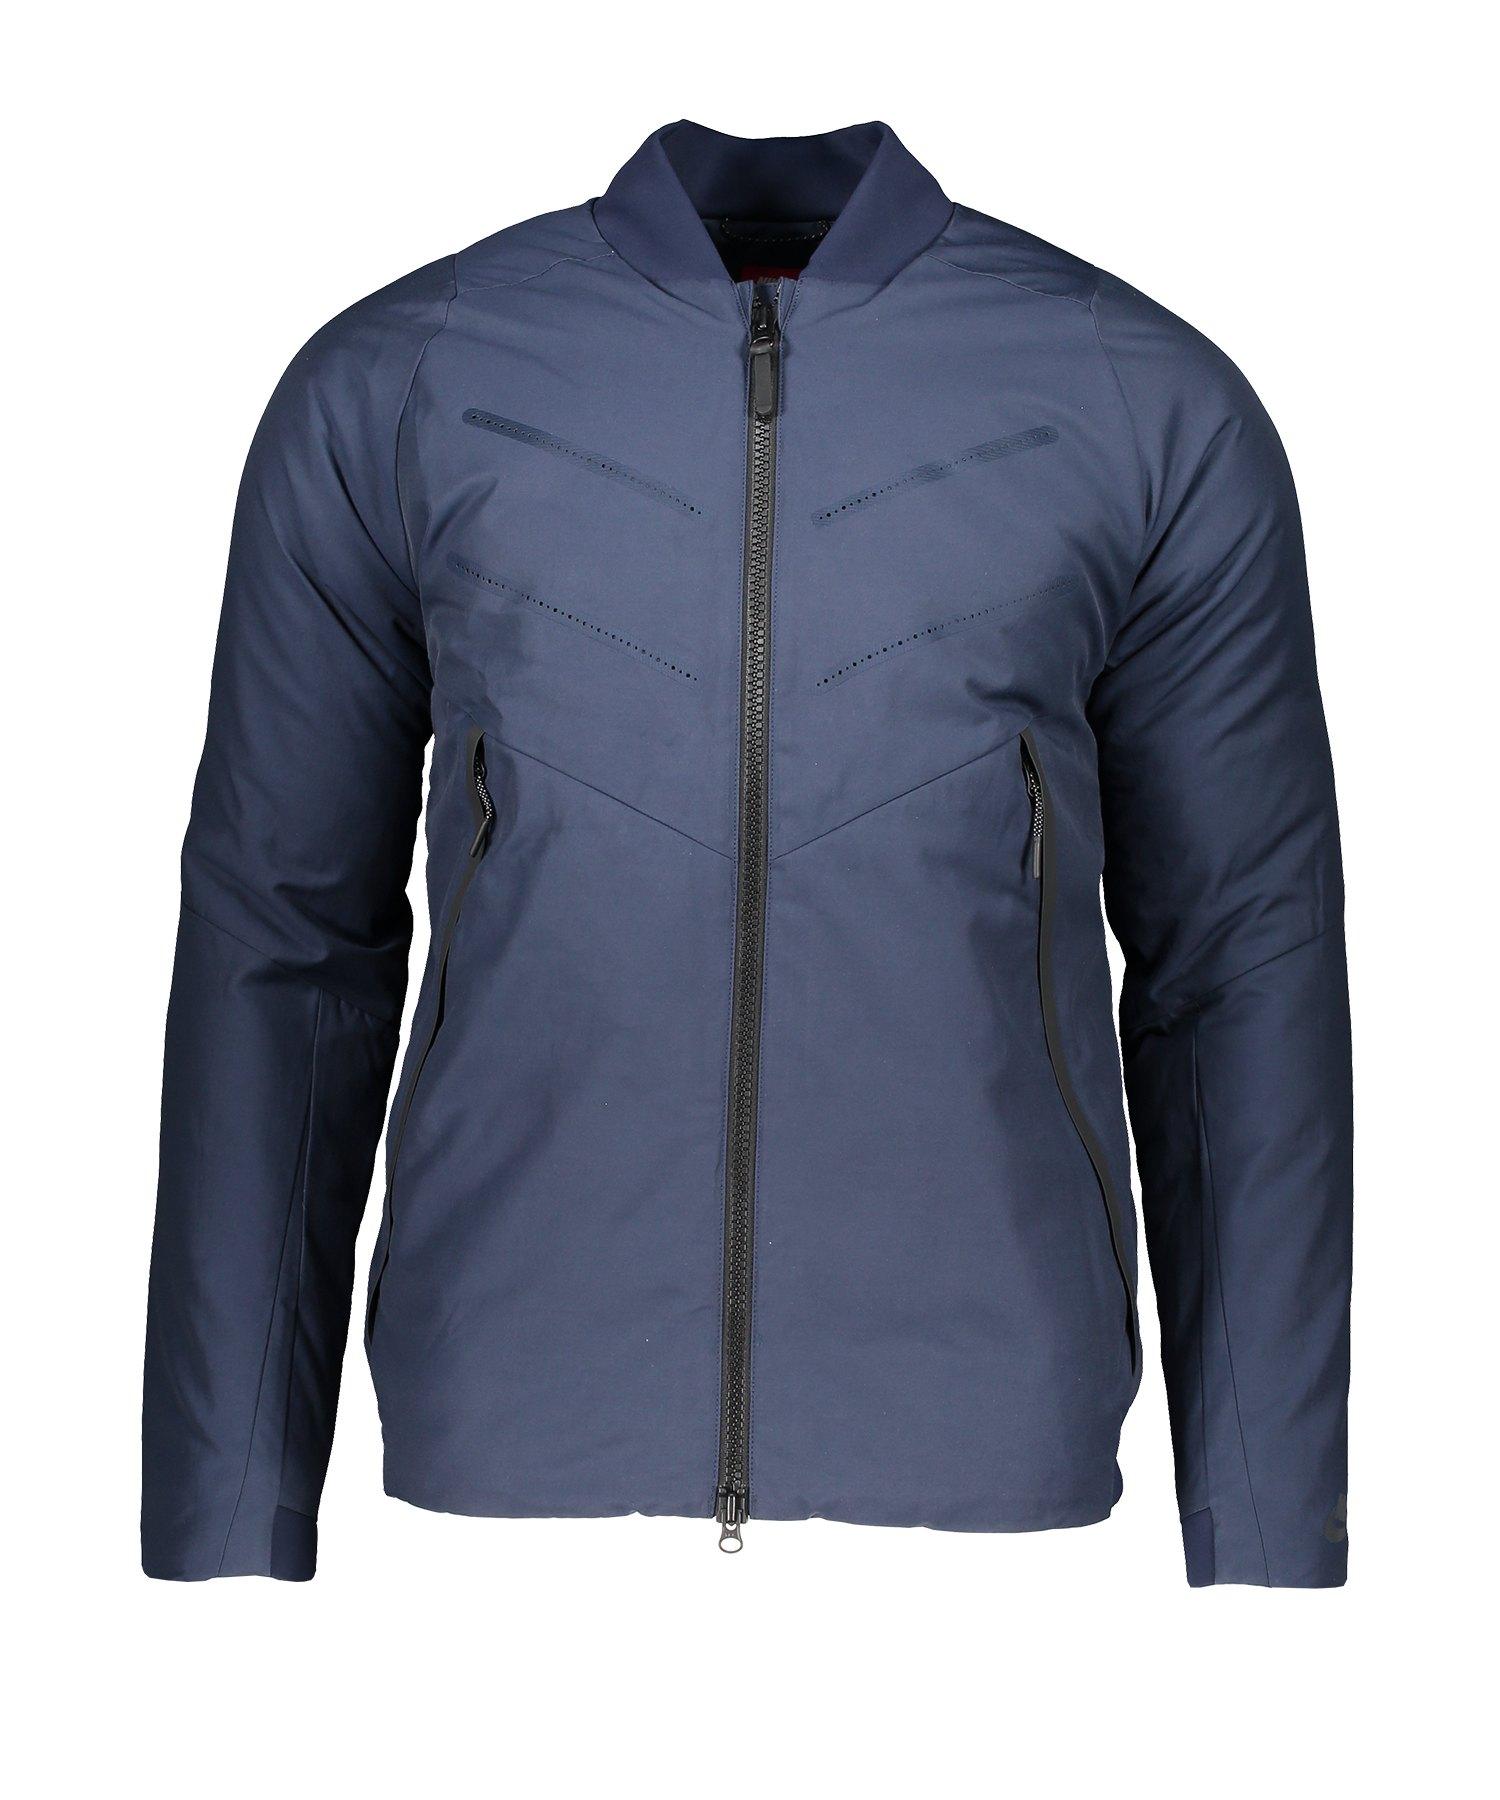 cheap for discount 27300 00772 Nike AeroLoft Bomber Jacket Jacke Blau F451